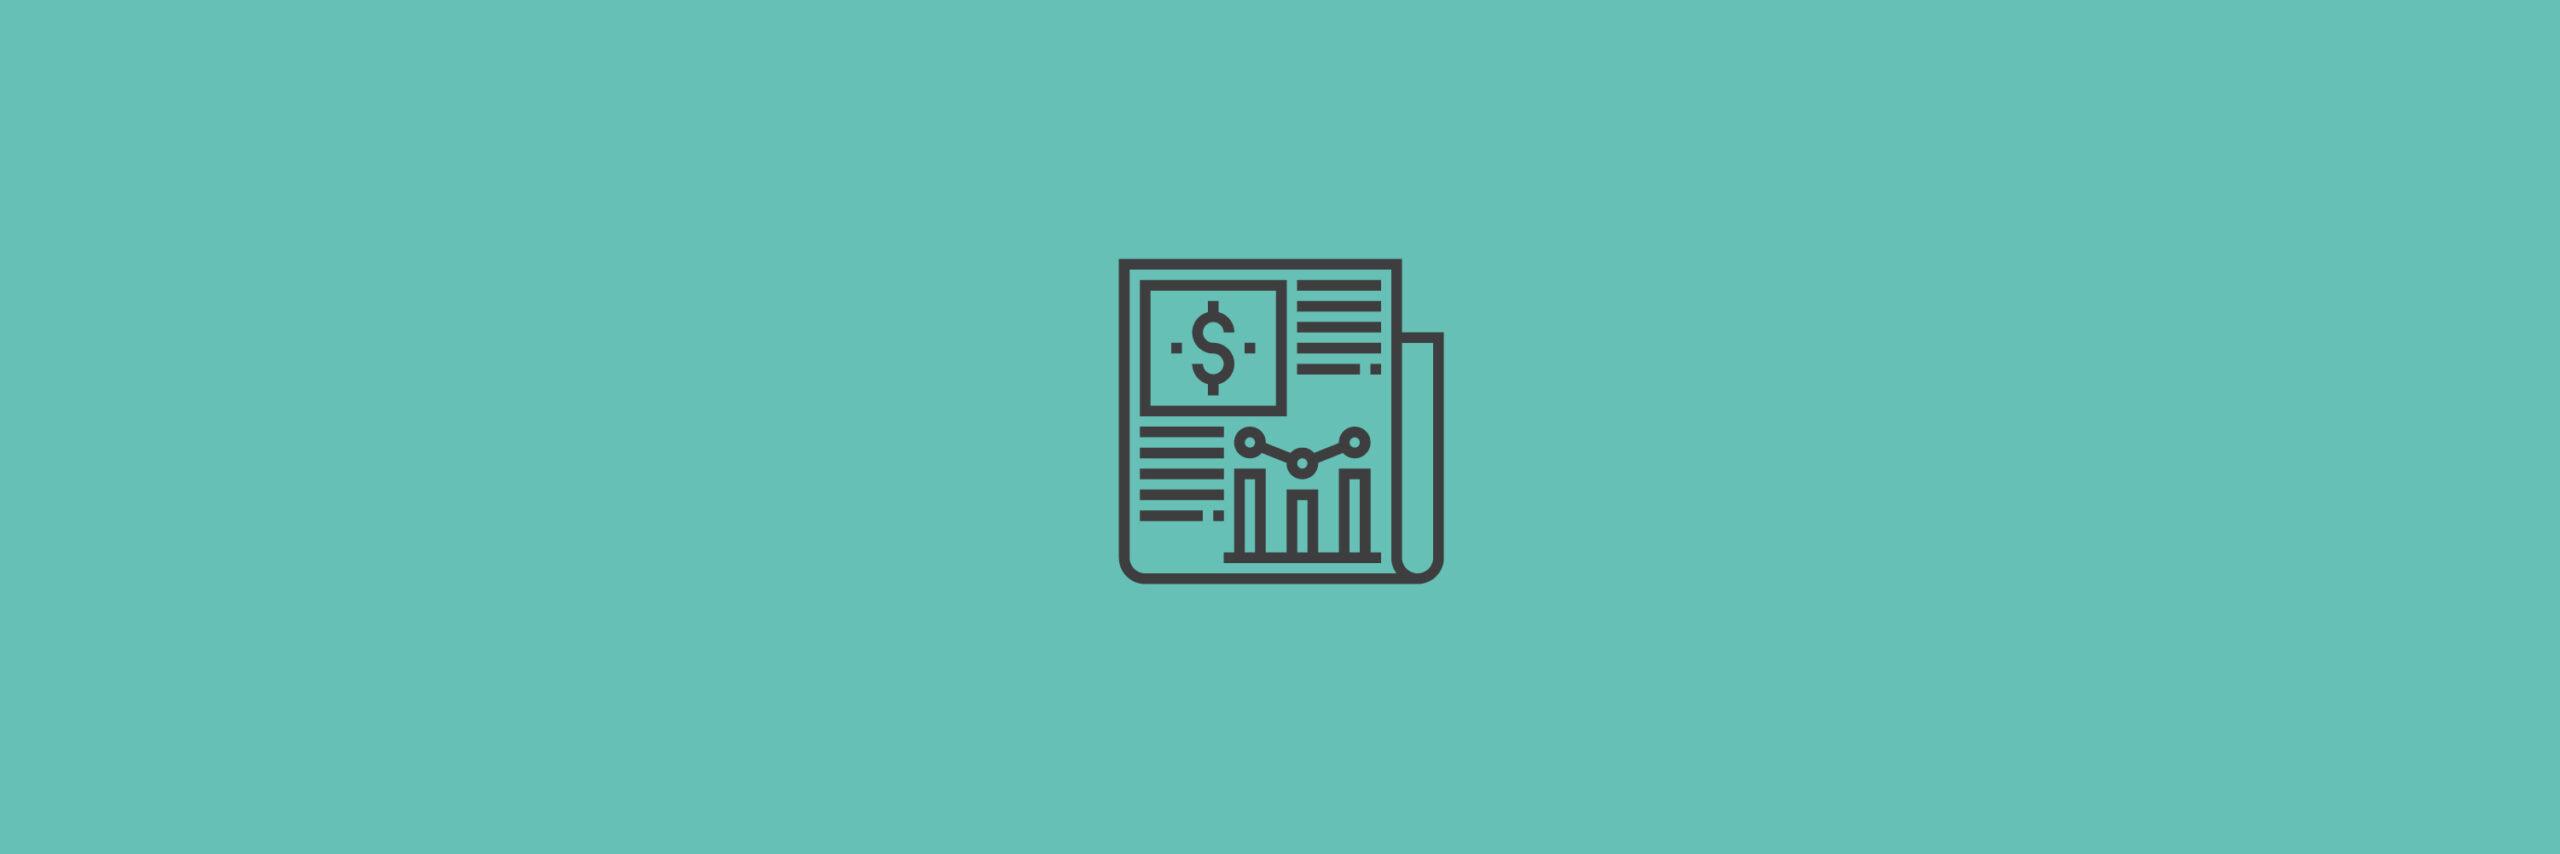 2020 equity report